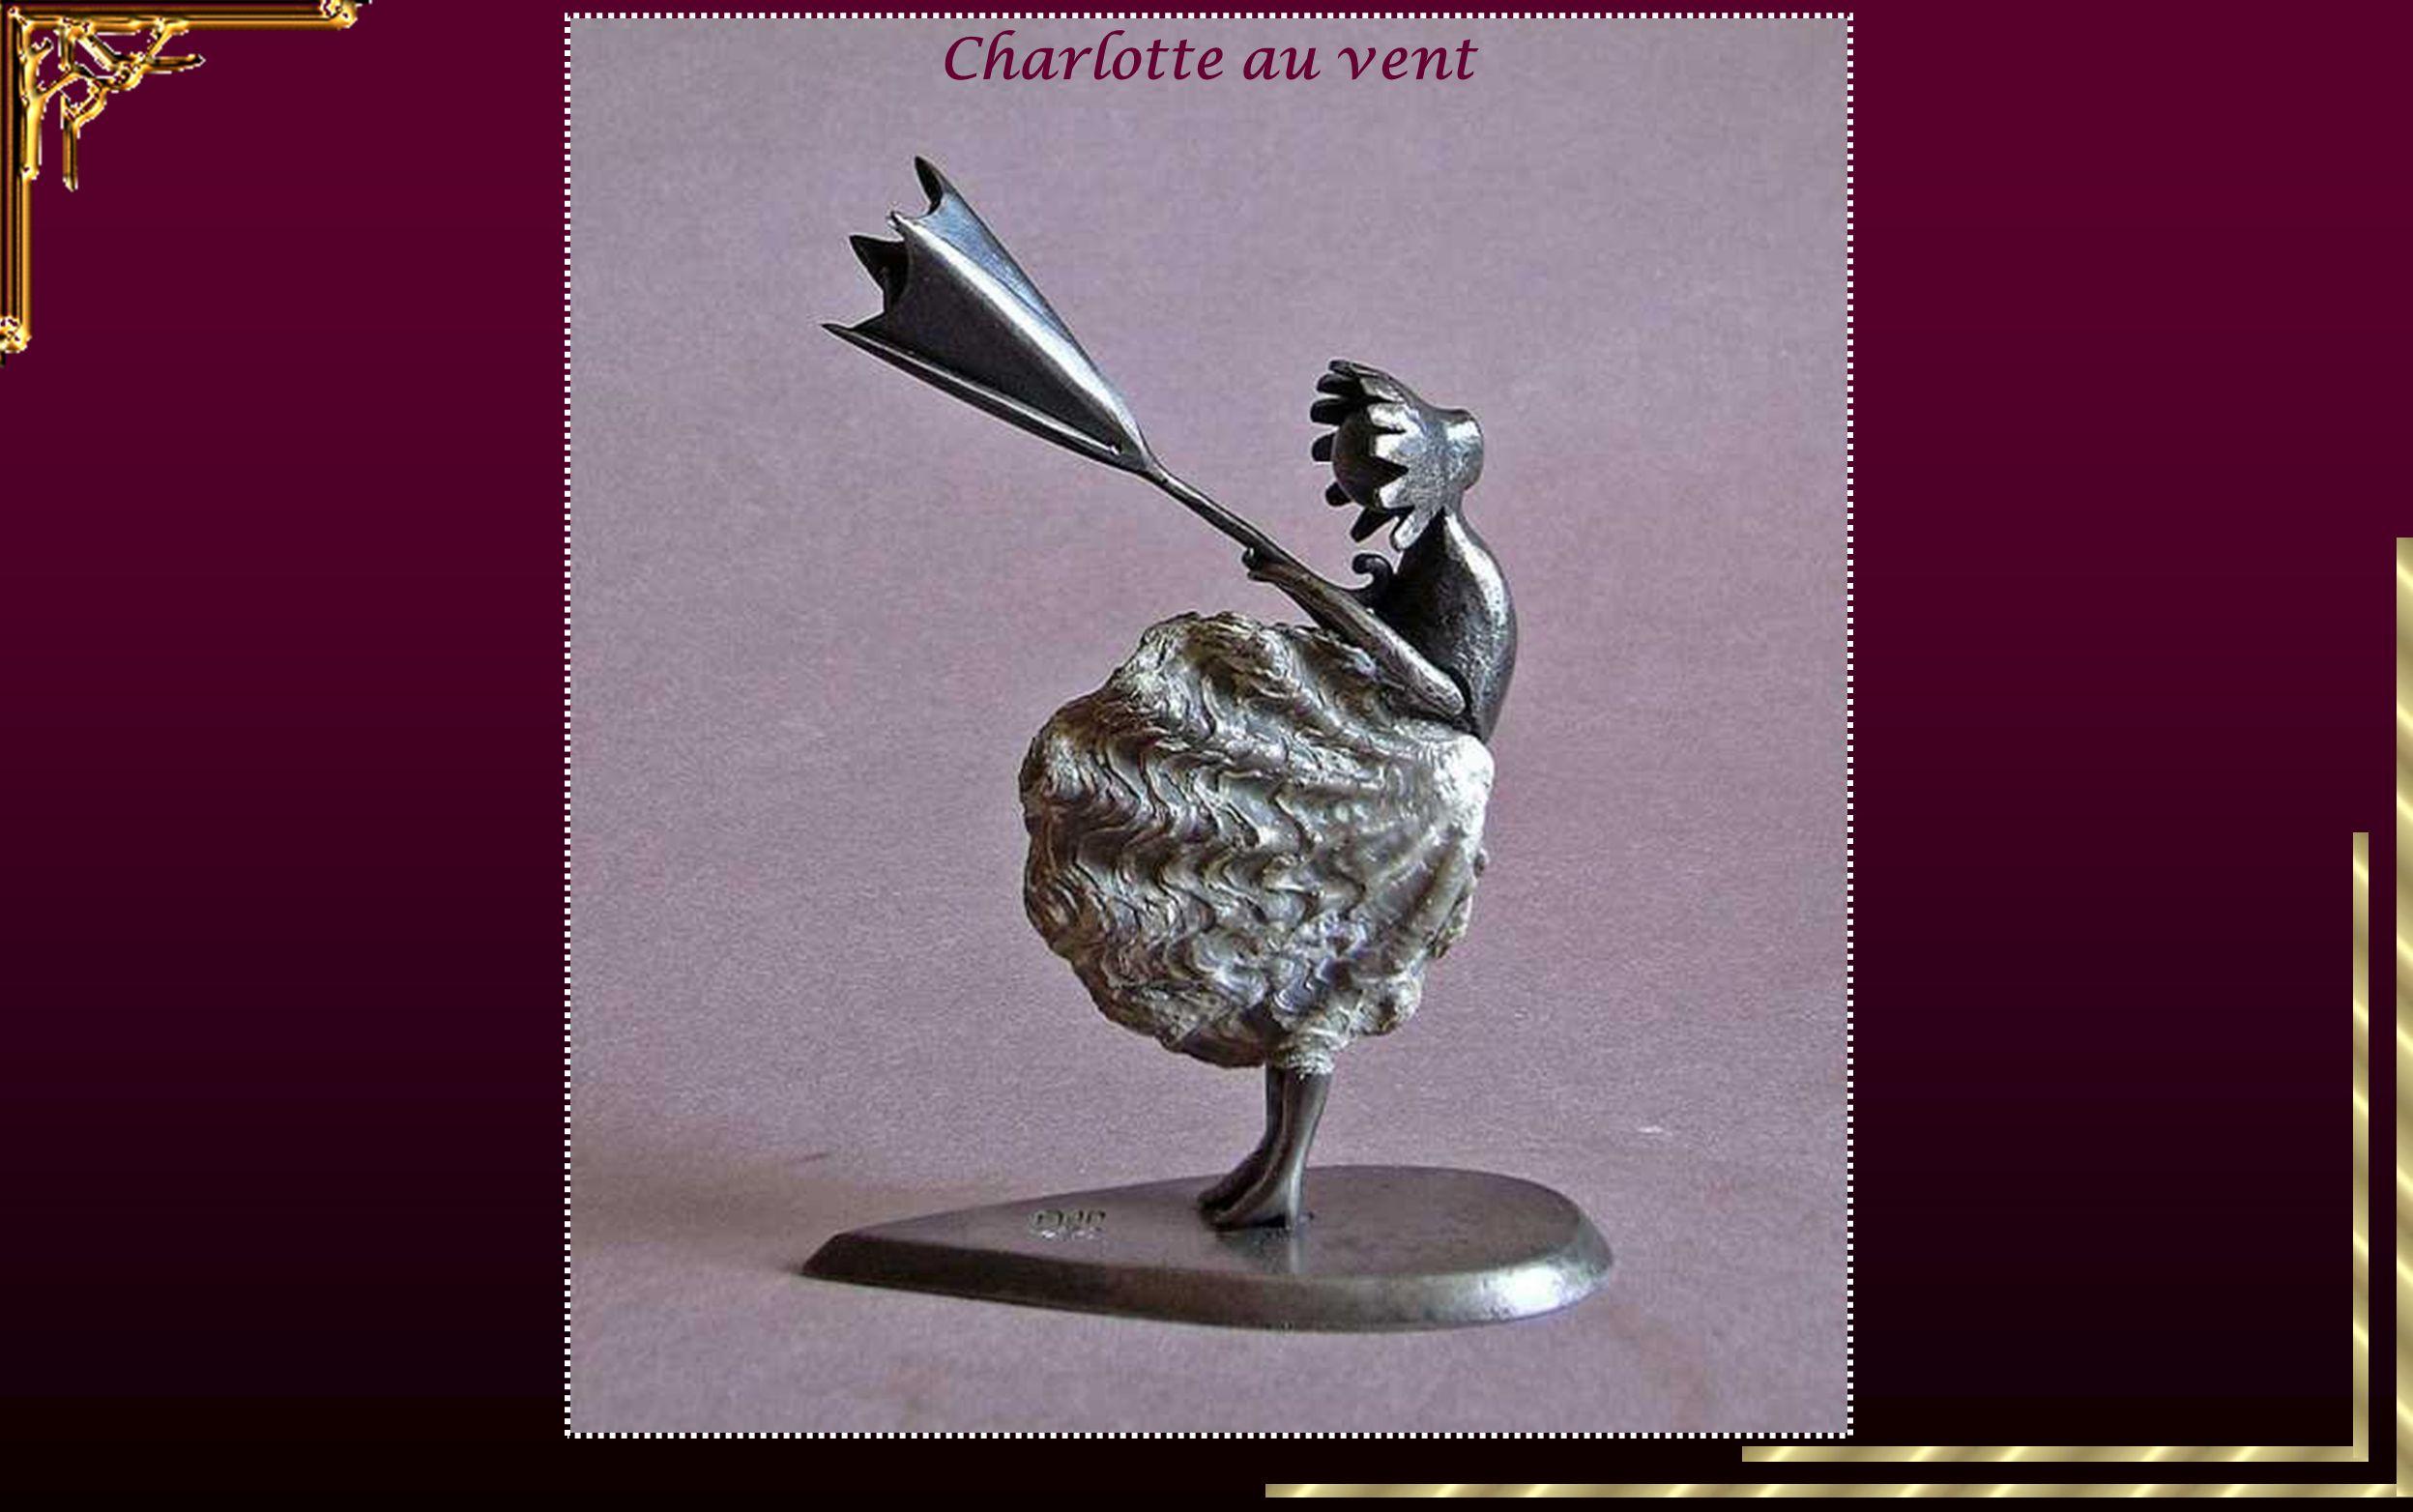 Charlotte au vent